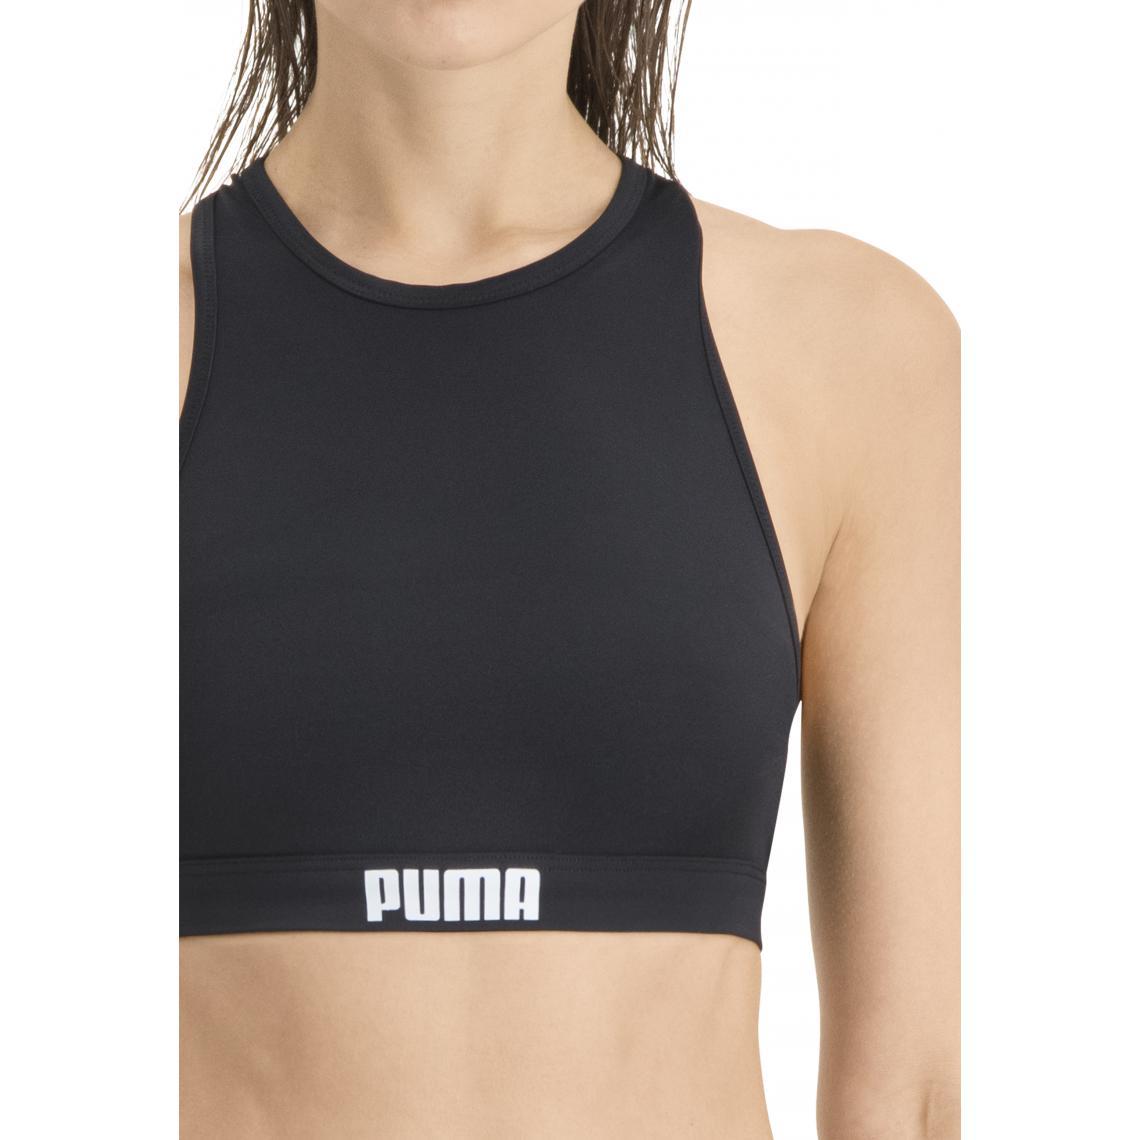 Haut de Maillot de Bain brassière Noir Puma - Puma femme - Modalova